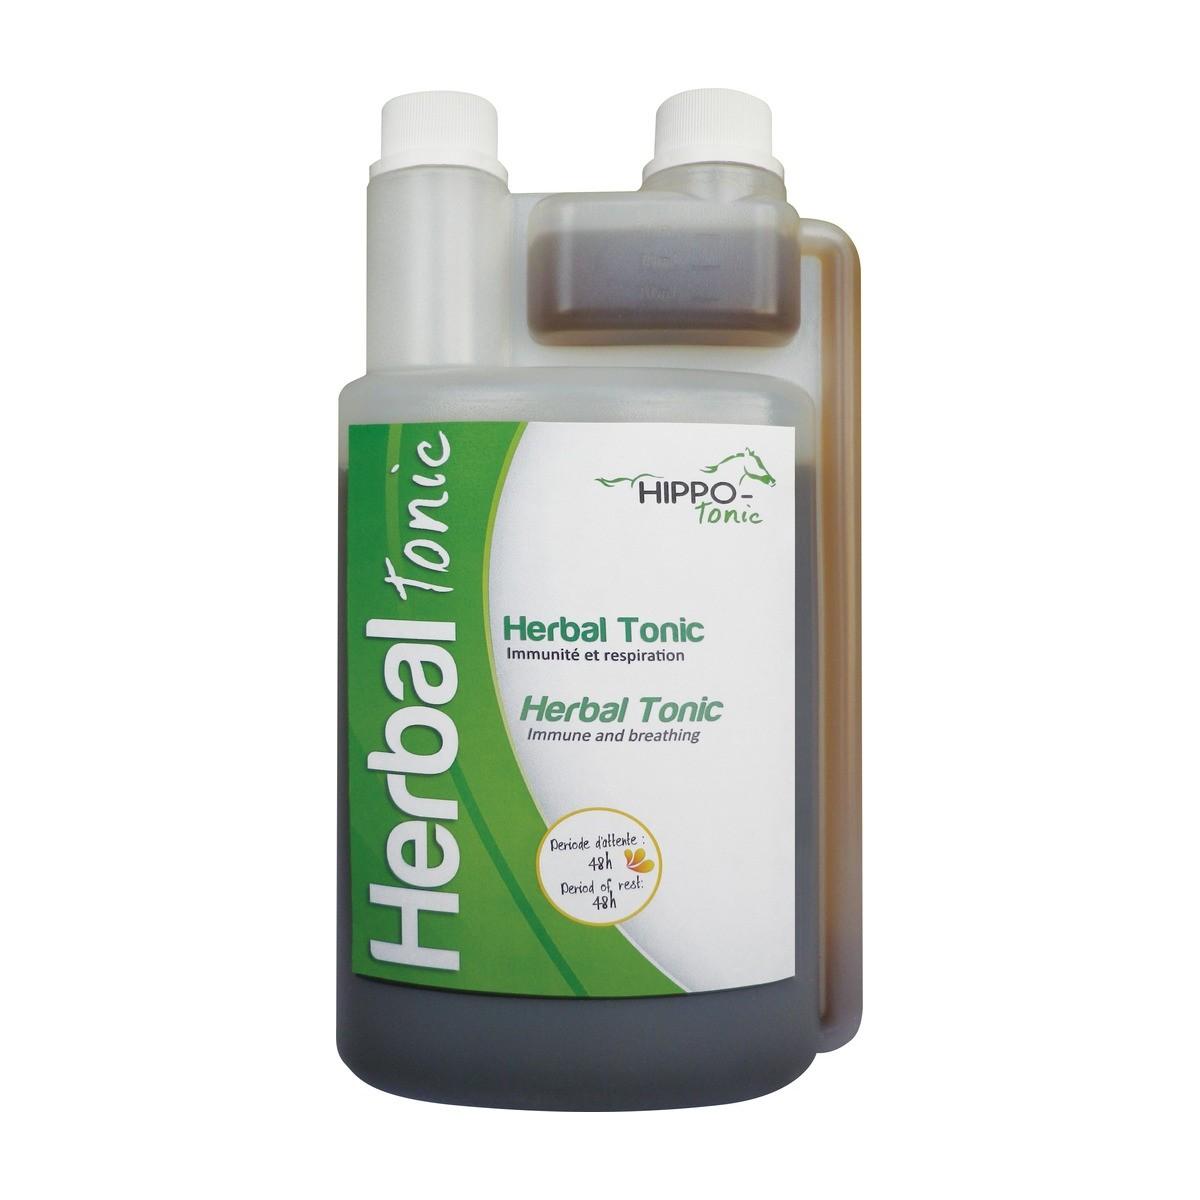 Hippotonic Herbal Tonic (Immune & Breathing)